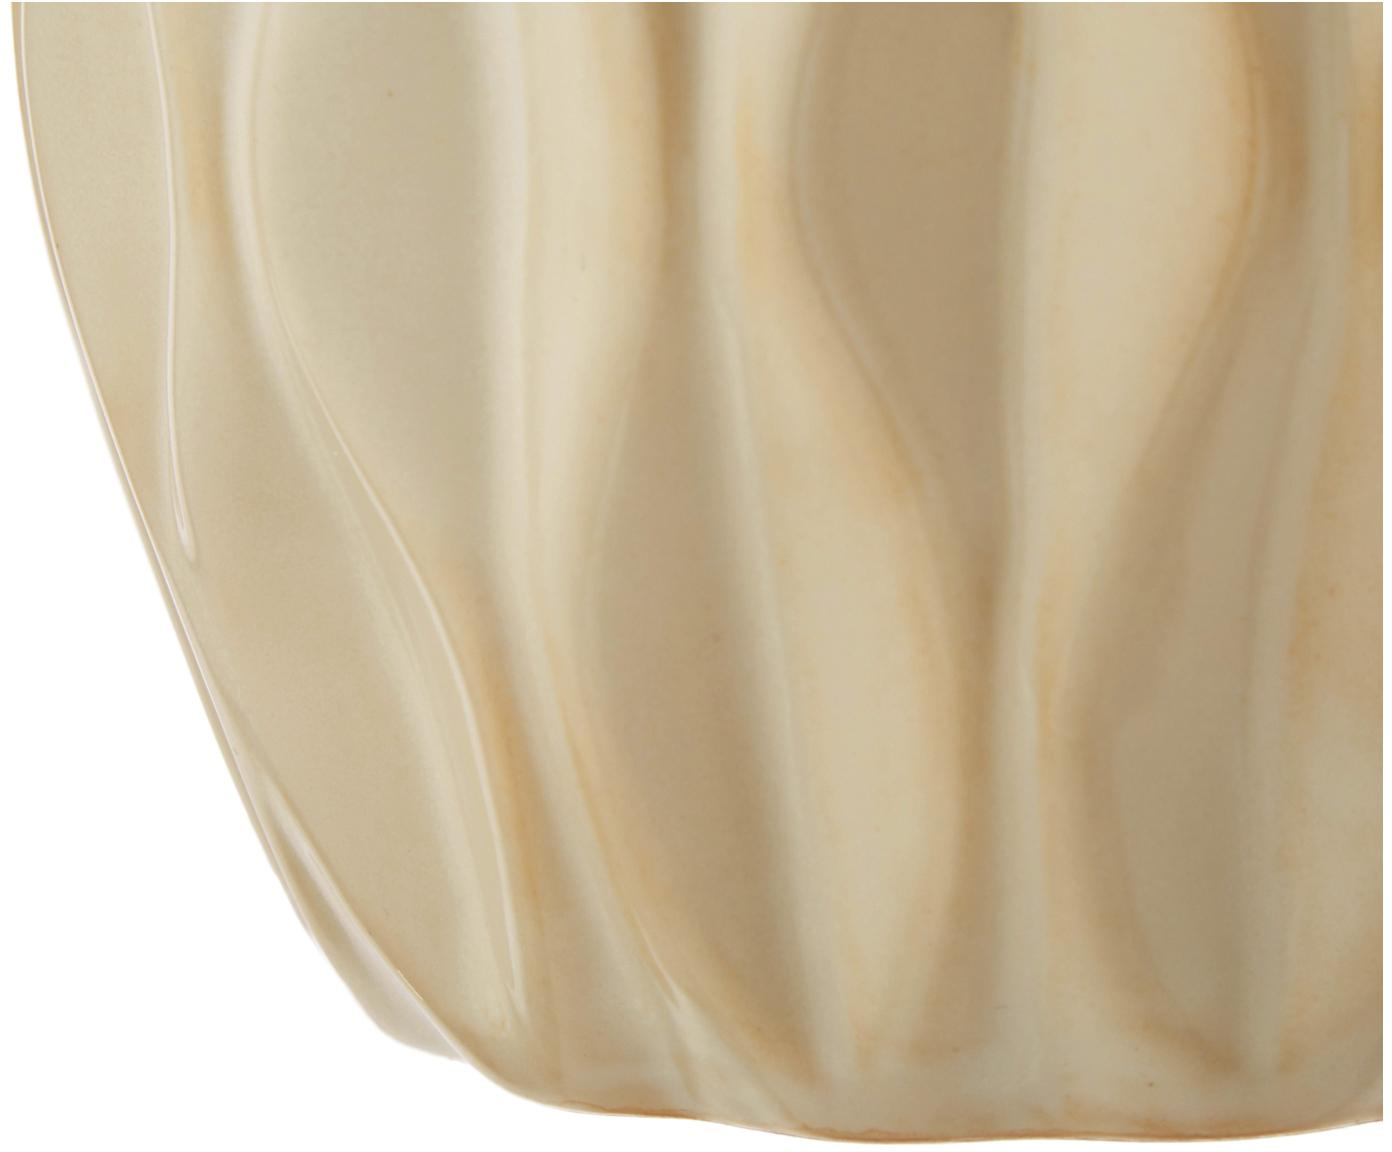 Vazenset Zalina, 4-delig, Porselein, Crèmekleurig, beige, Verschillende formaten